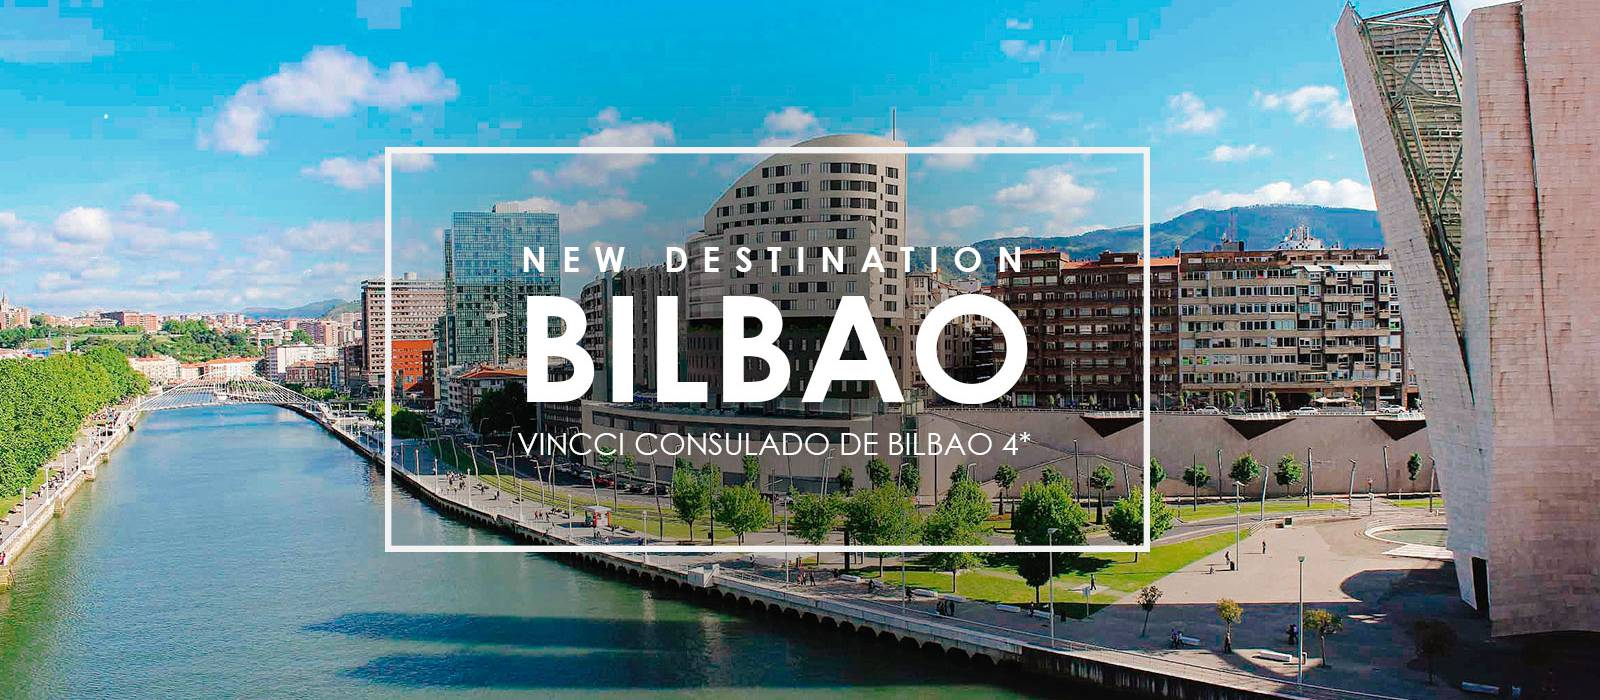 Apertura Bilbao EN - Vincci Consulado de Bilbao